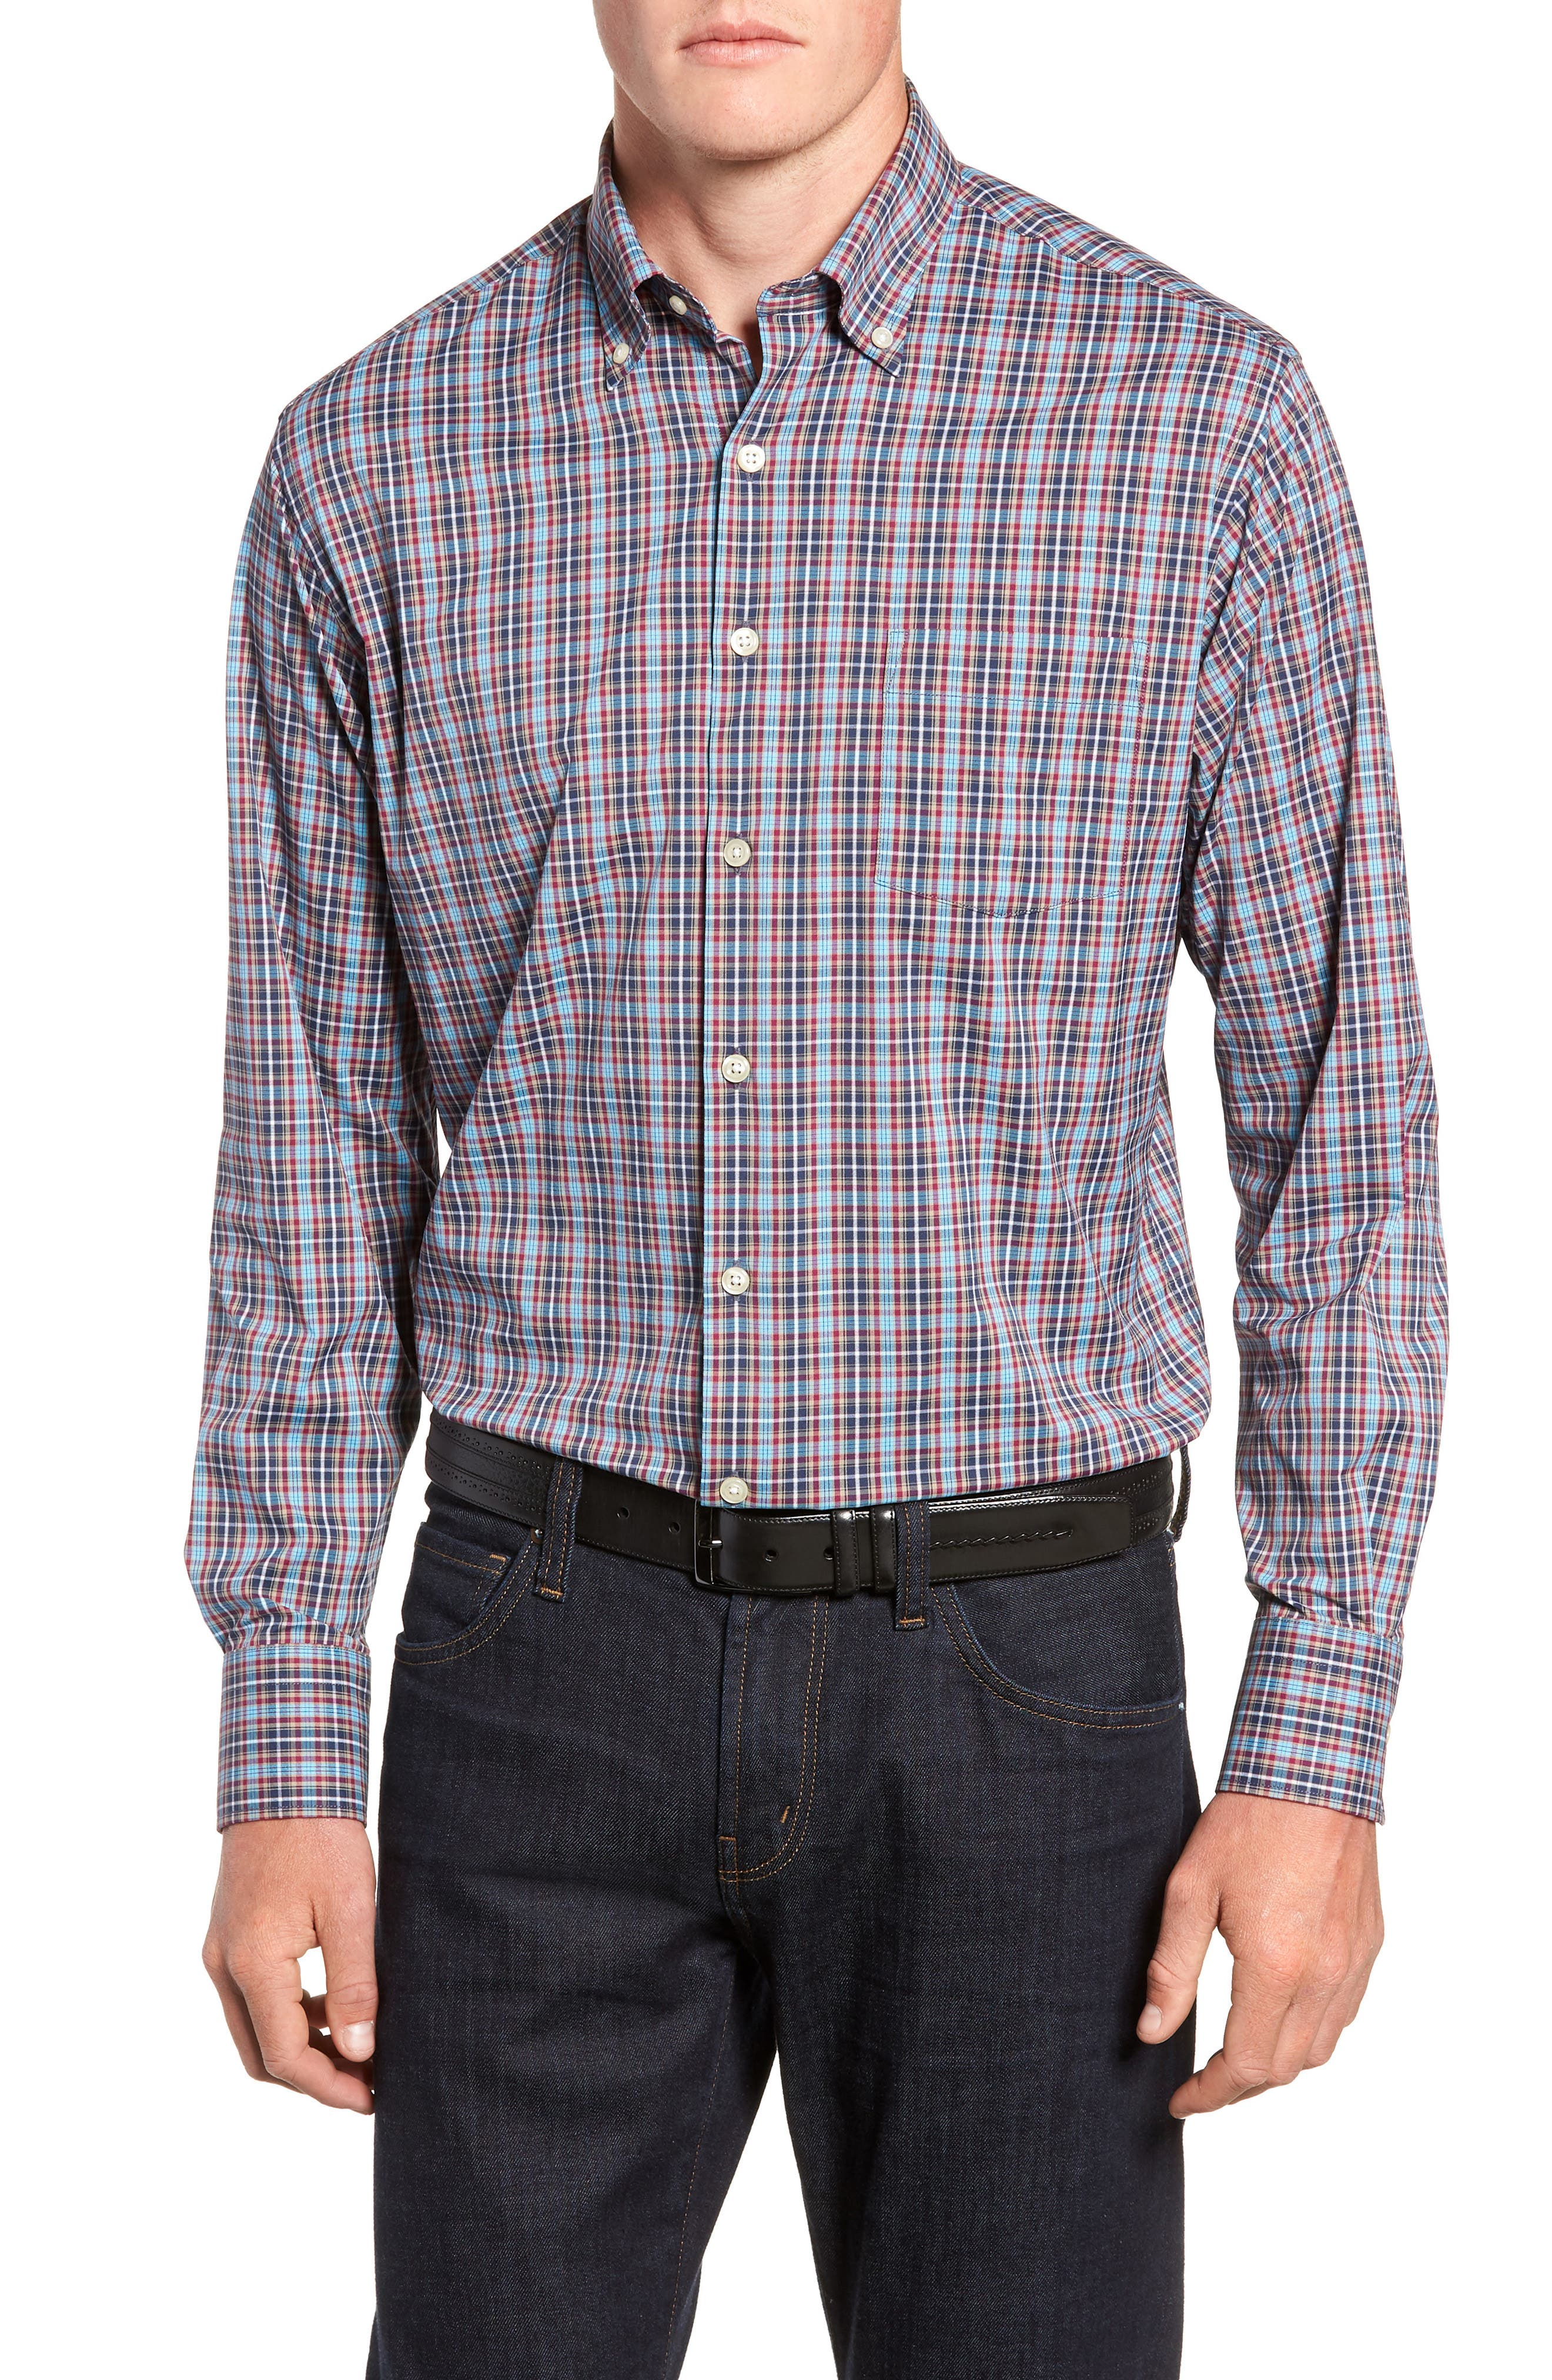 Clyde Plaid Performance Sport Shirt,                         Main,                         color, NAVY